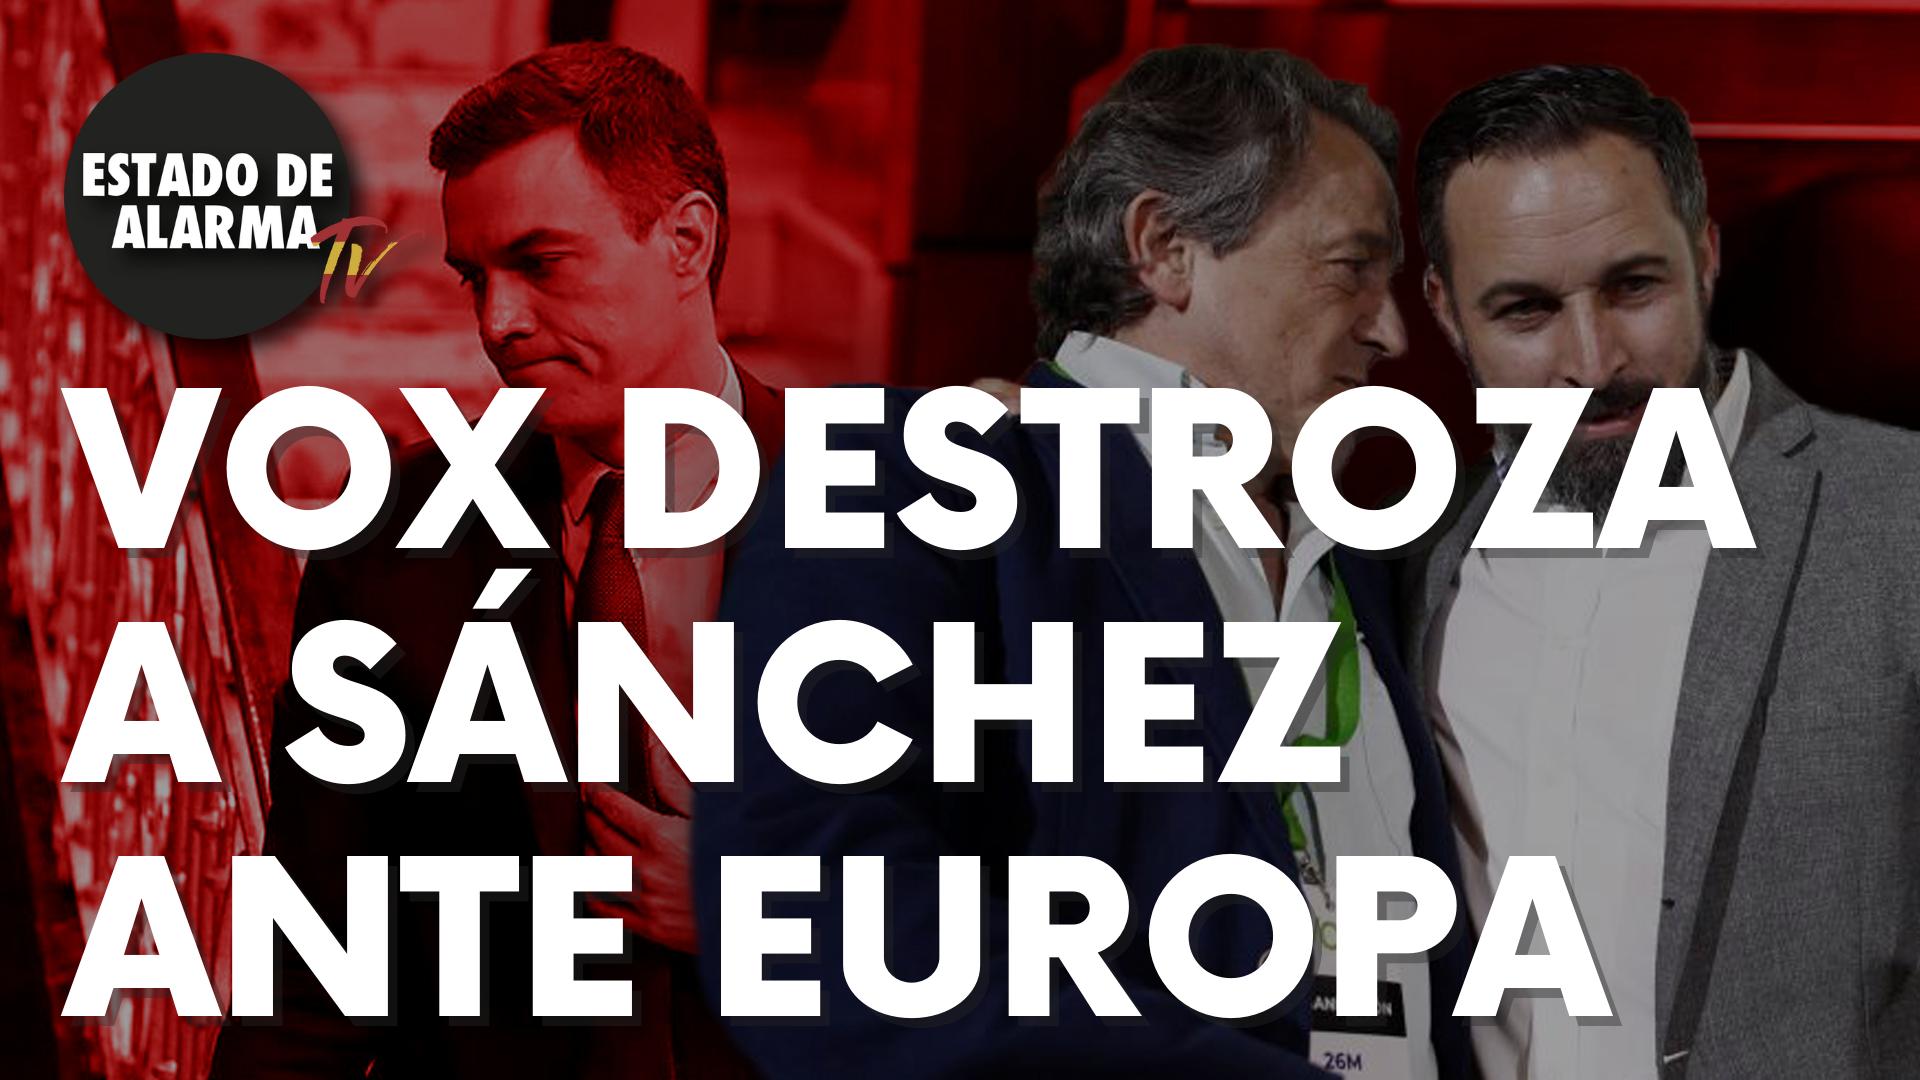 Vox destroza a Sánchez ante Europa